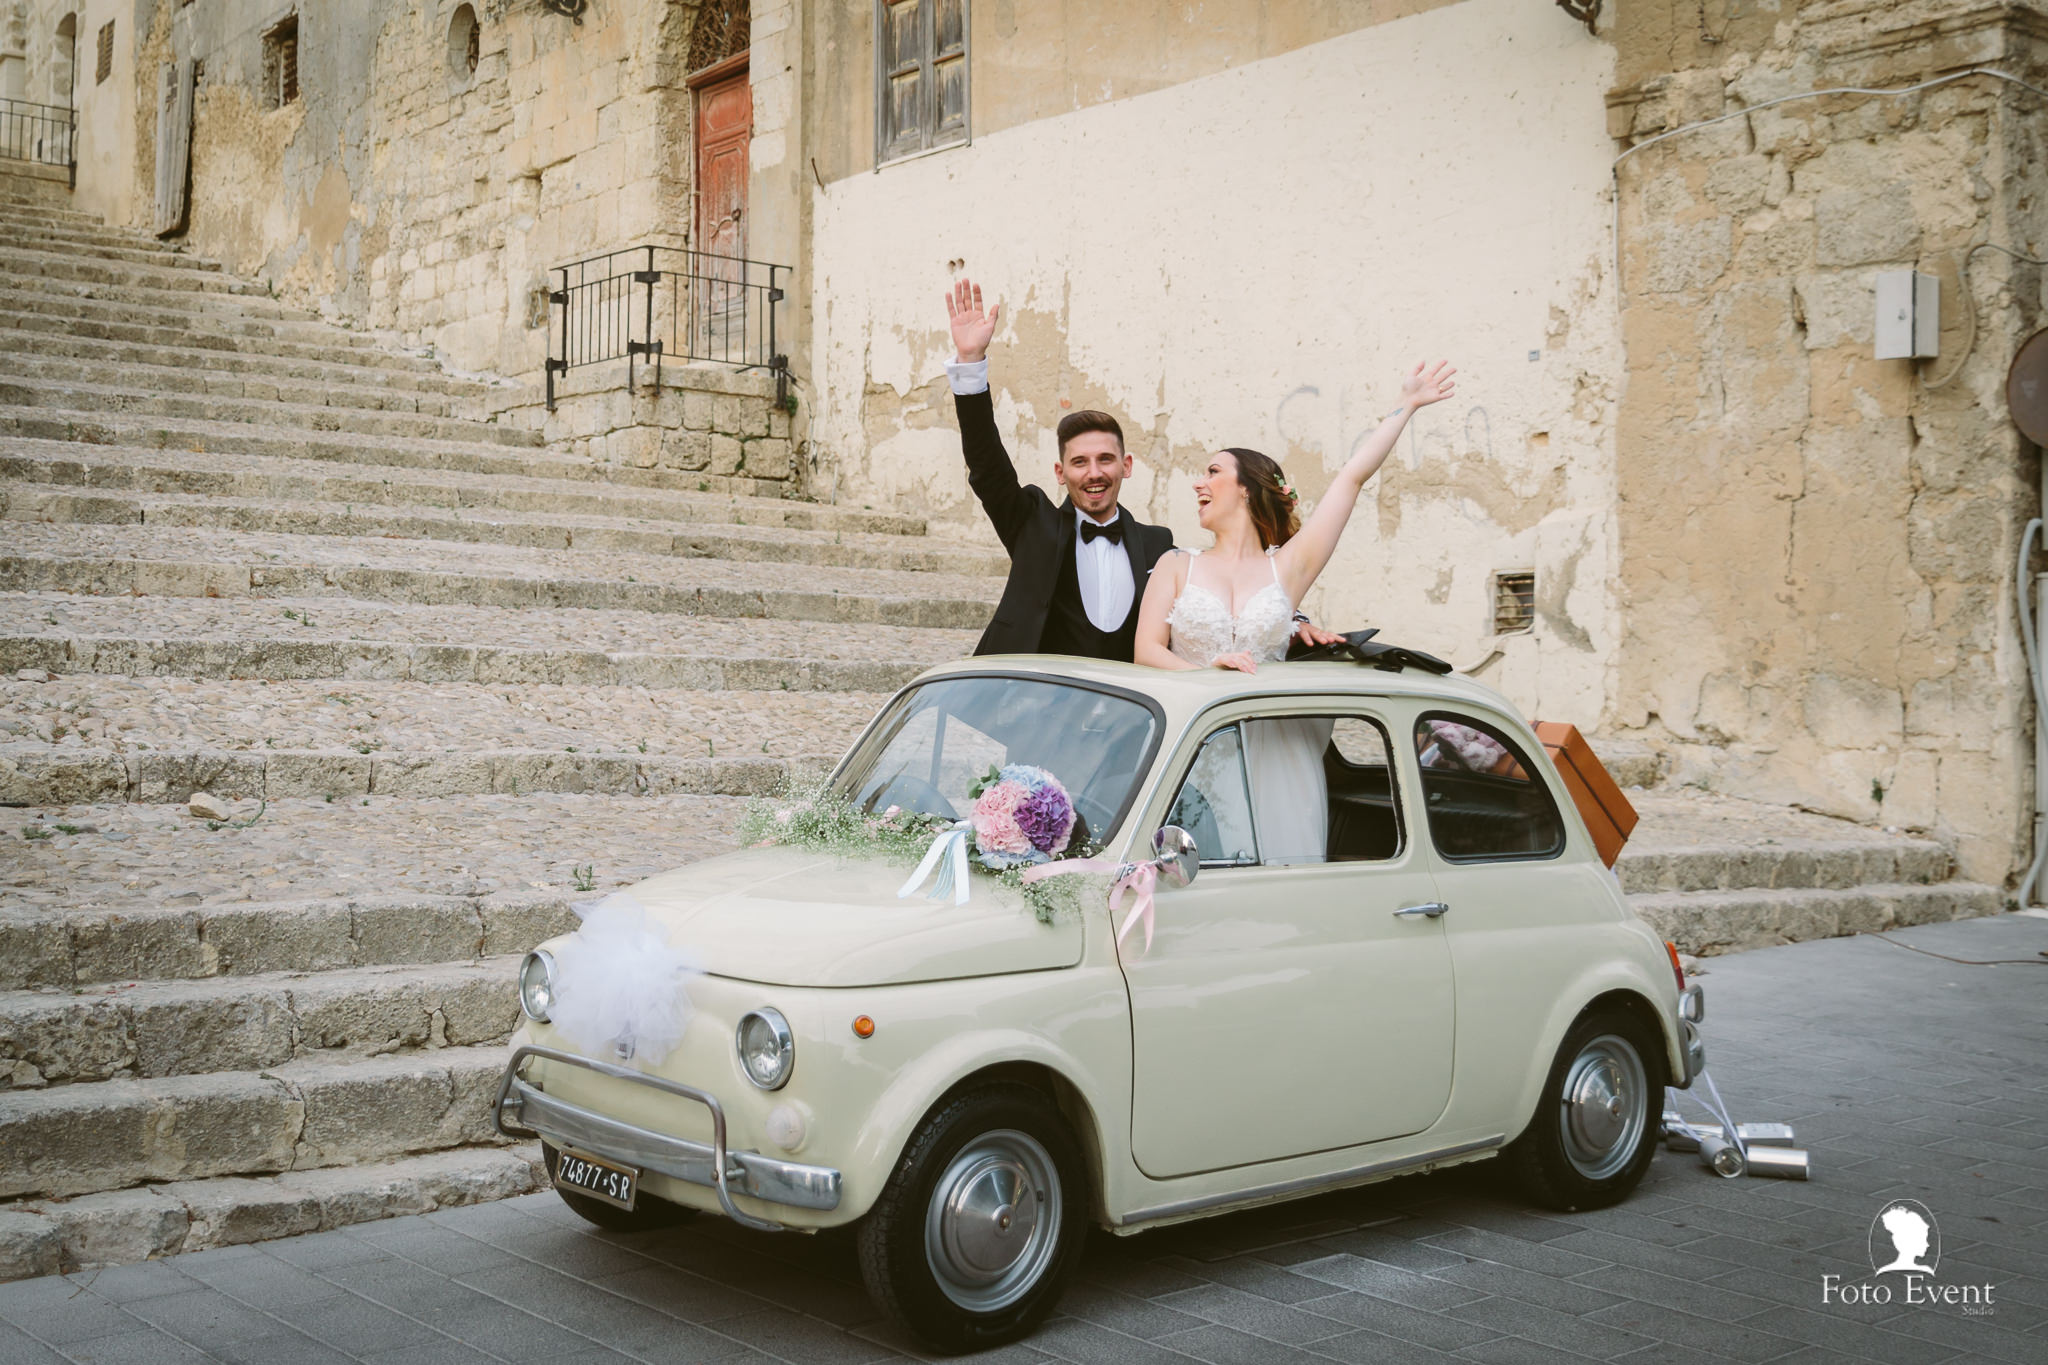 046-2019-08-22-Matrimonio-Angela-e-Nicola-Iaconis-1587